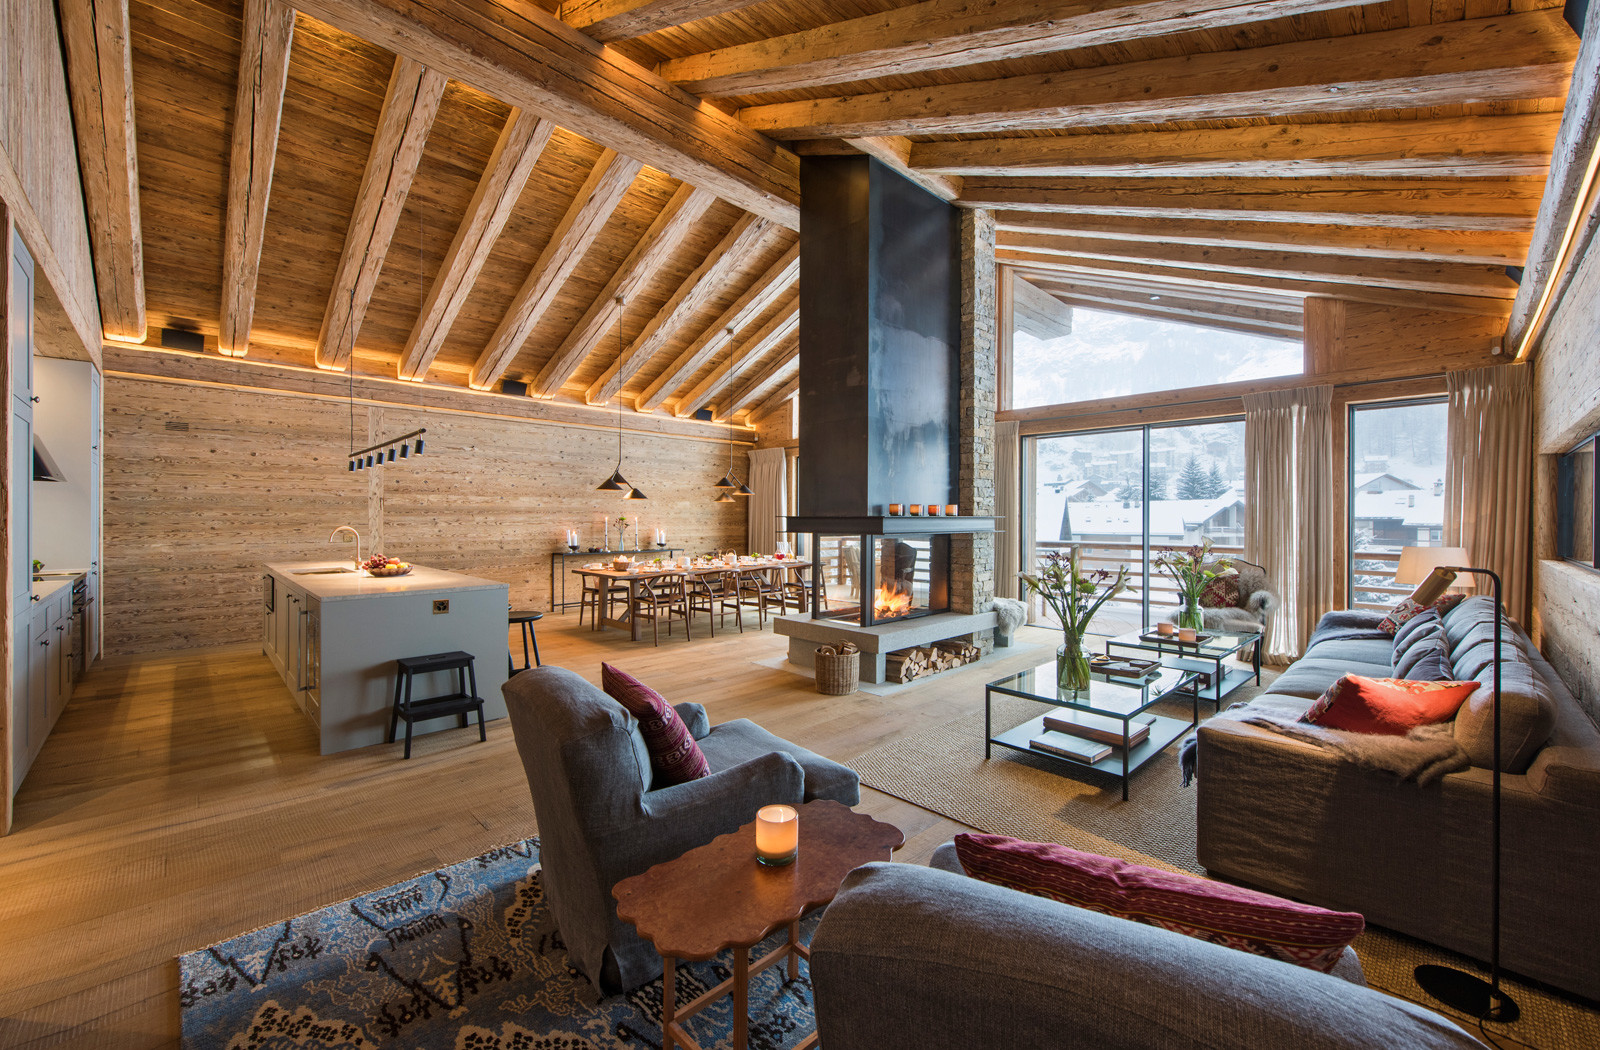 Kings-avenue-zermatt-snow-chalet-sauna-indoor-jacuzzi-fireplace-gym-ski-in-ski-out-08-1